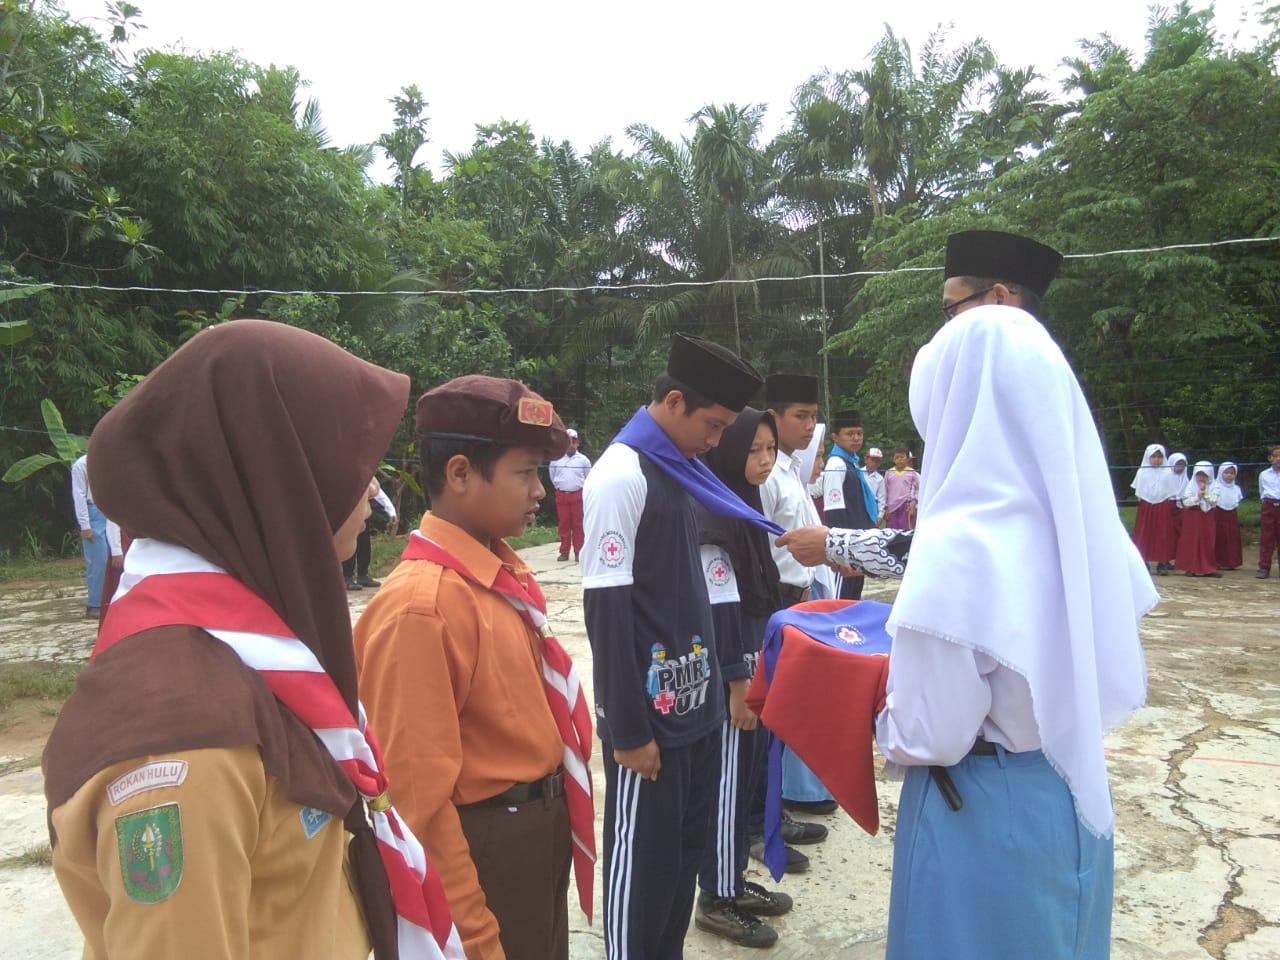 Kepala MTs Nurul Huda Lantik Anggota PMR, OSIS, dan Pramuka Masa Bakti 2018/2019